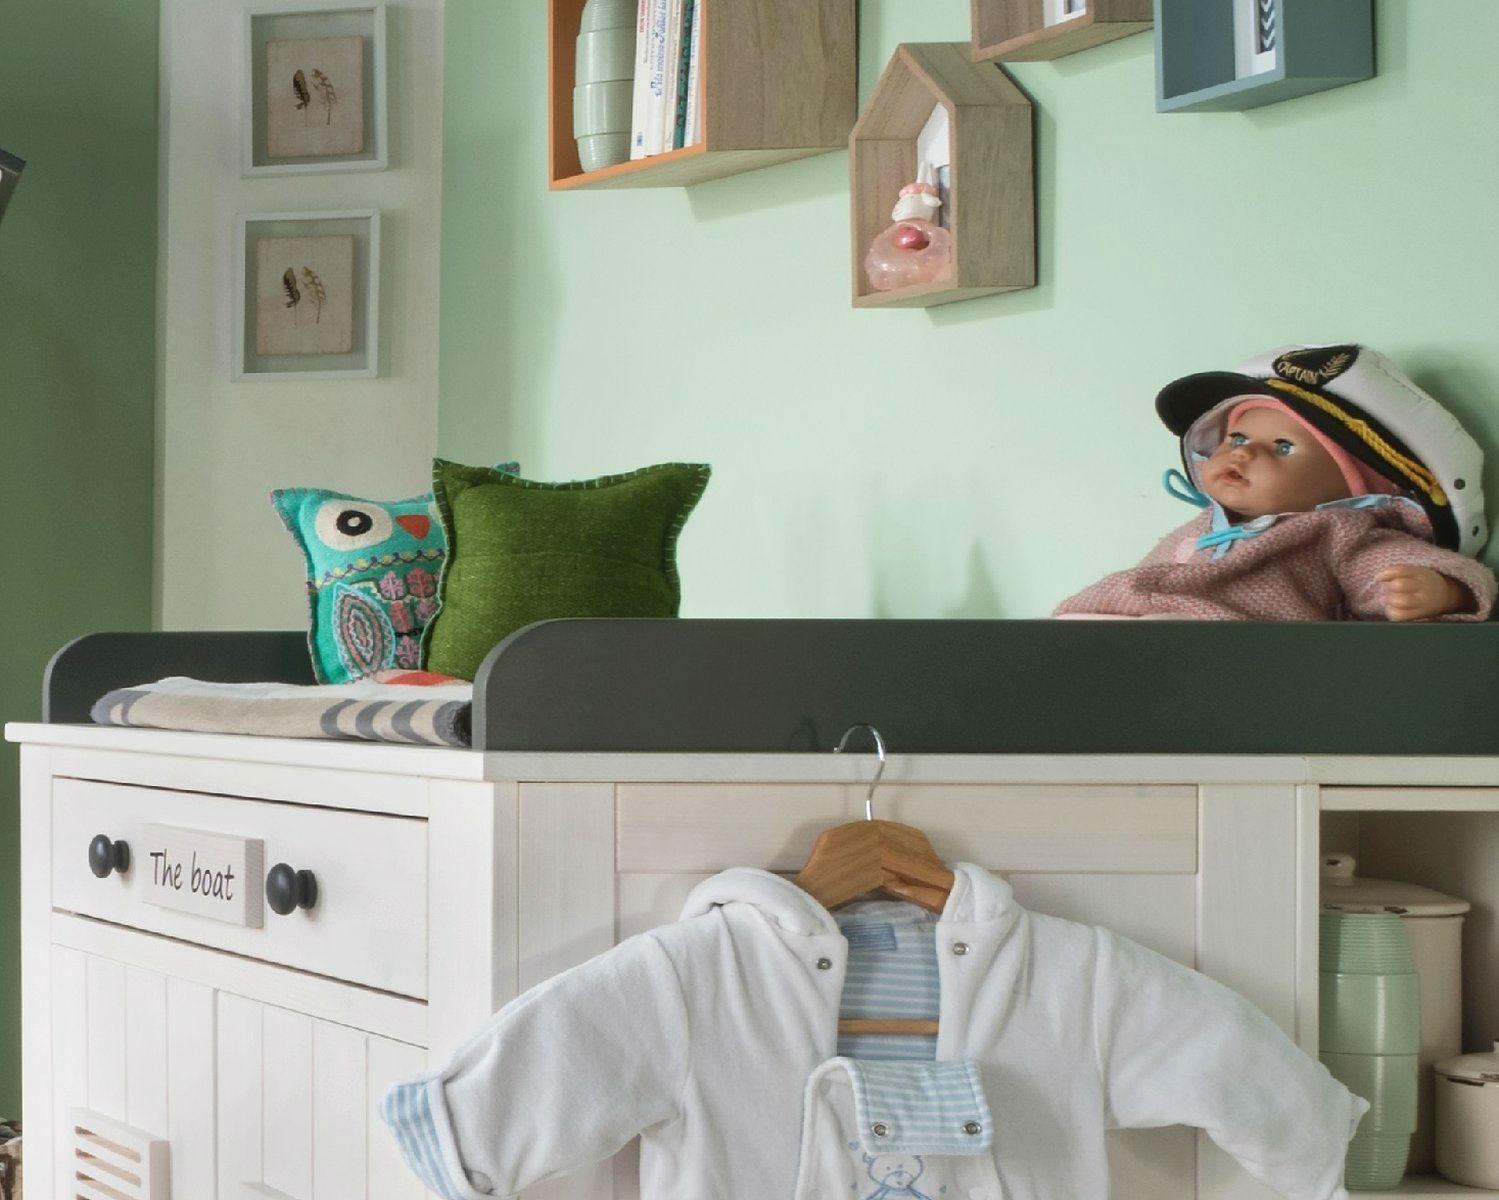 INFANSKIDS Babyzimmer Kinderzimmer Lucky Massivholz, Bild 11